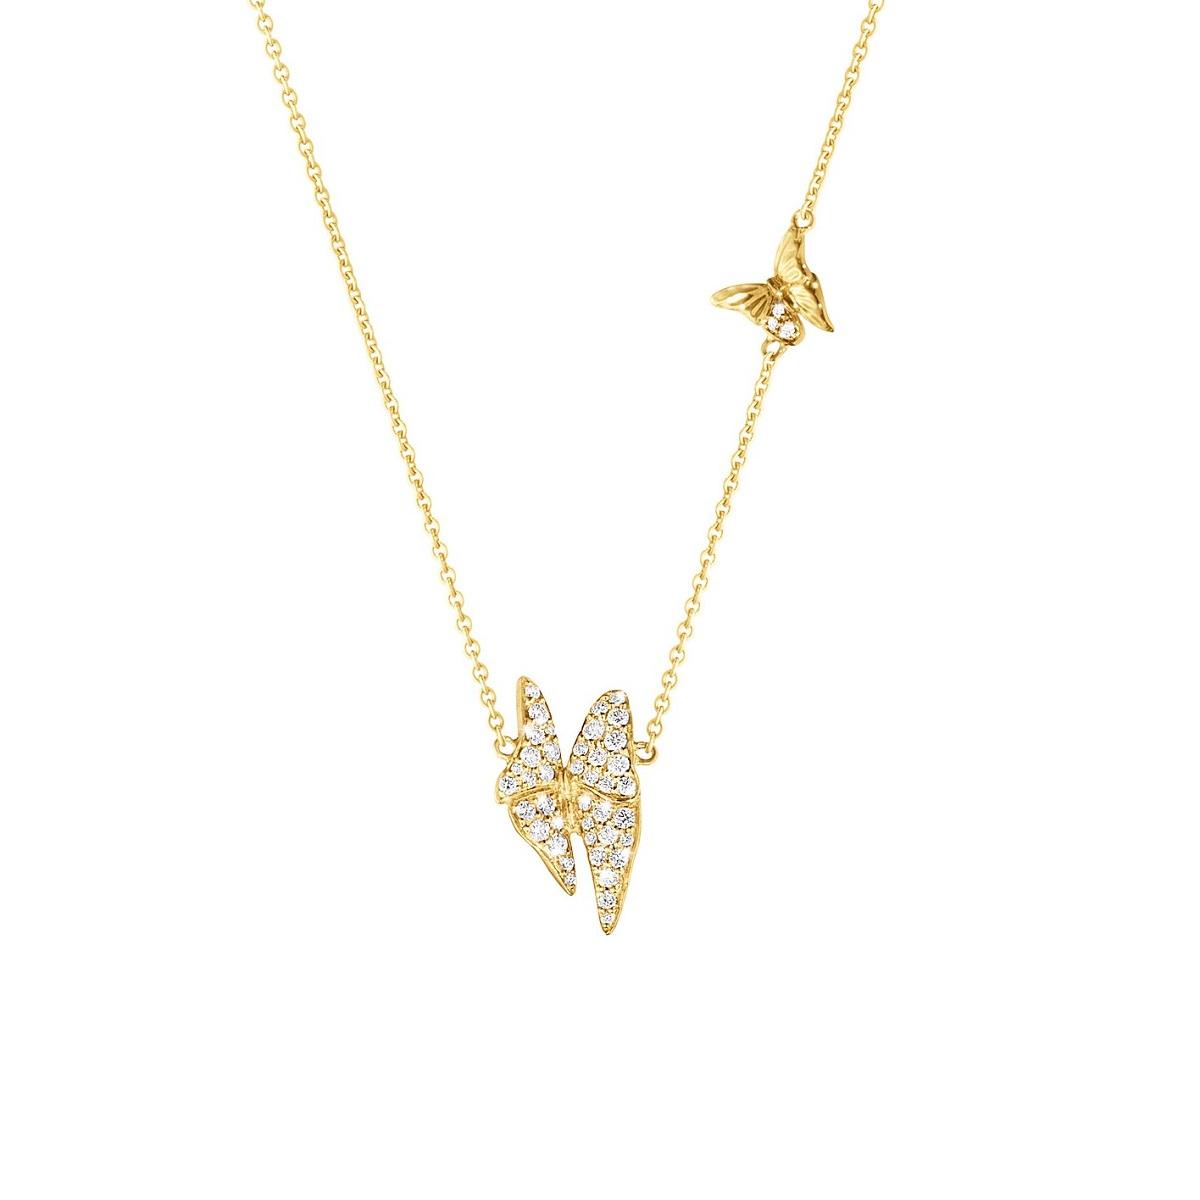 18ct-yellow-gold-diamond-set-askill-pendant